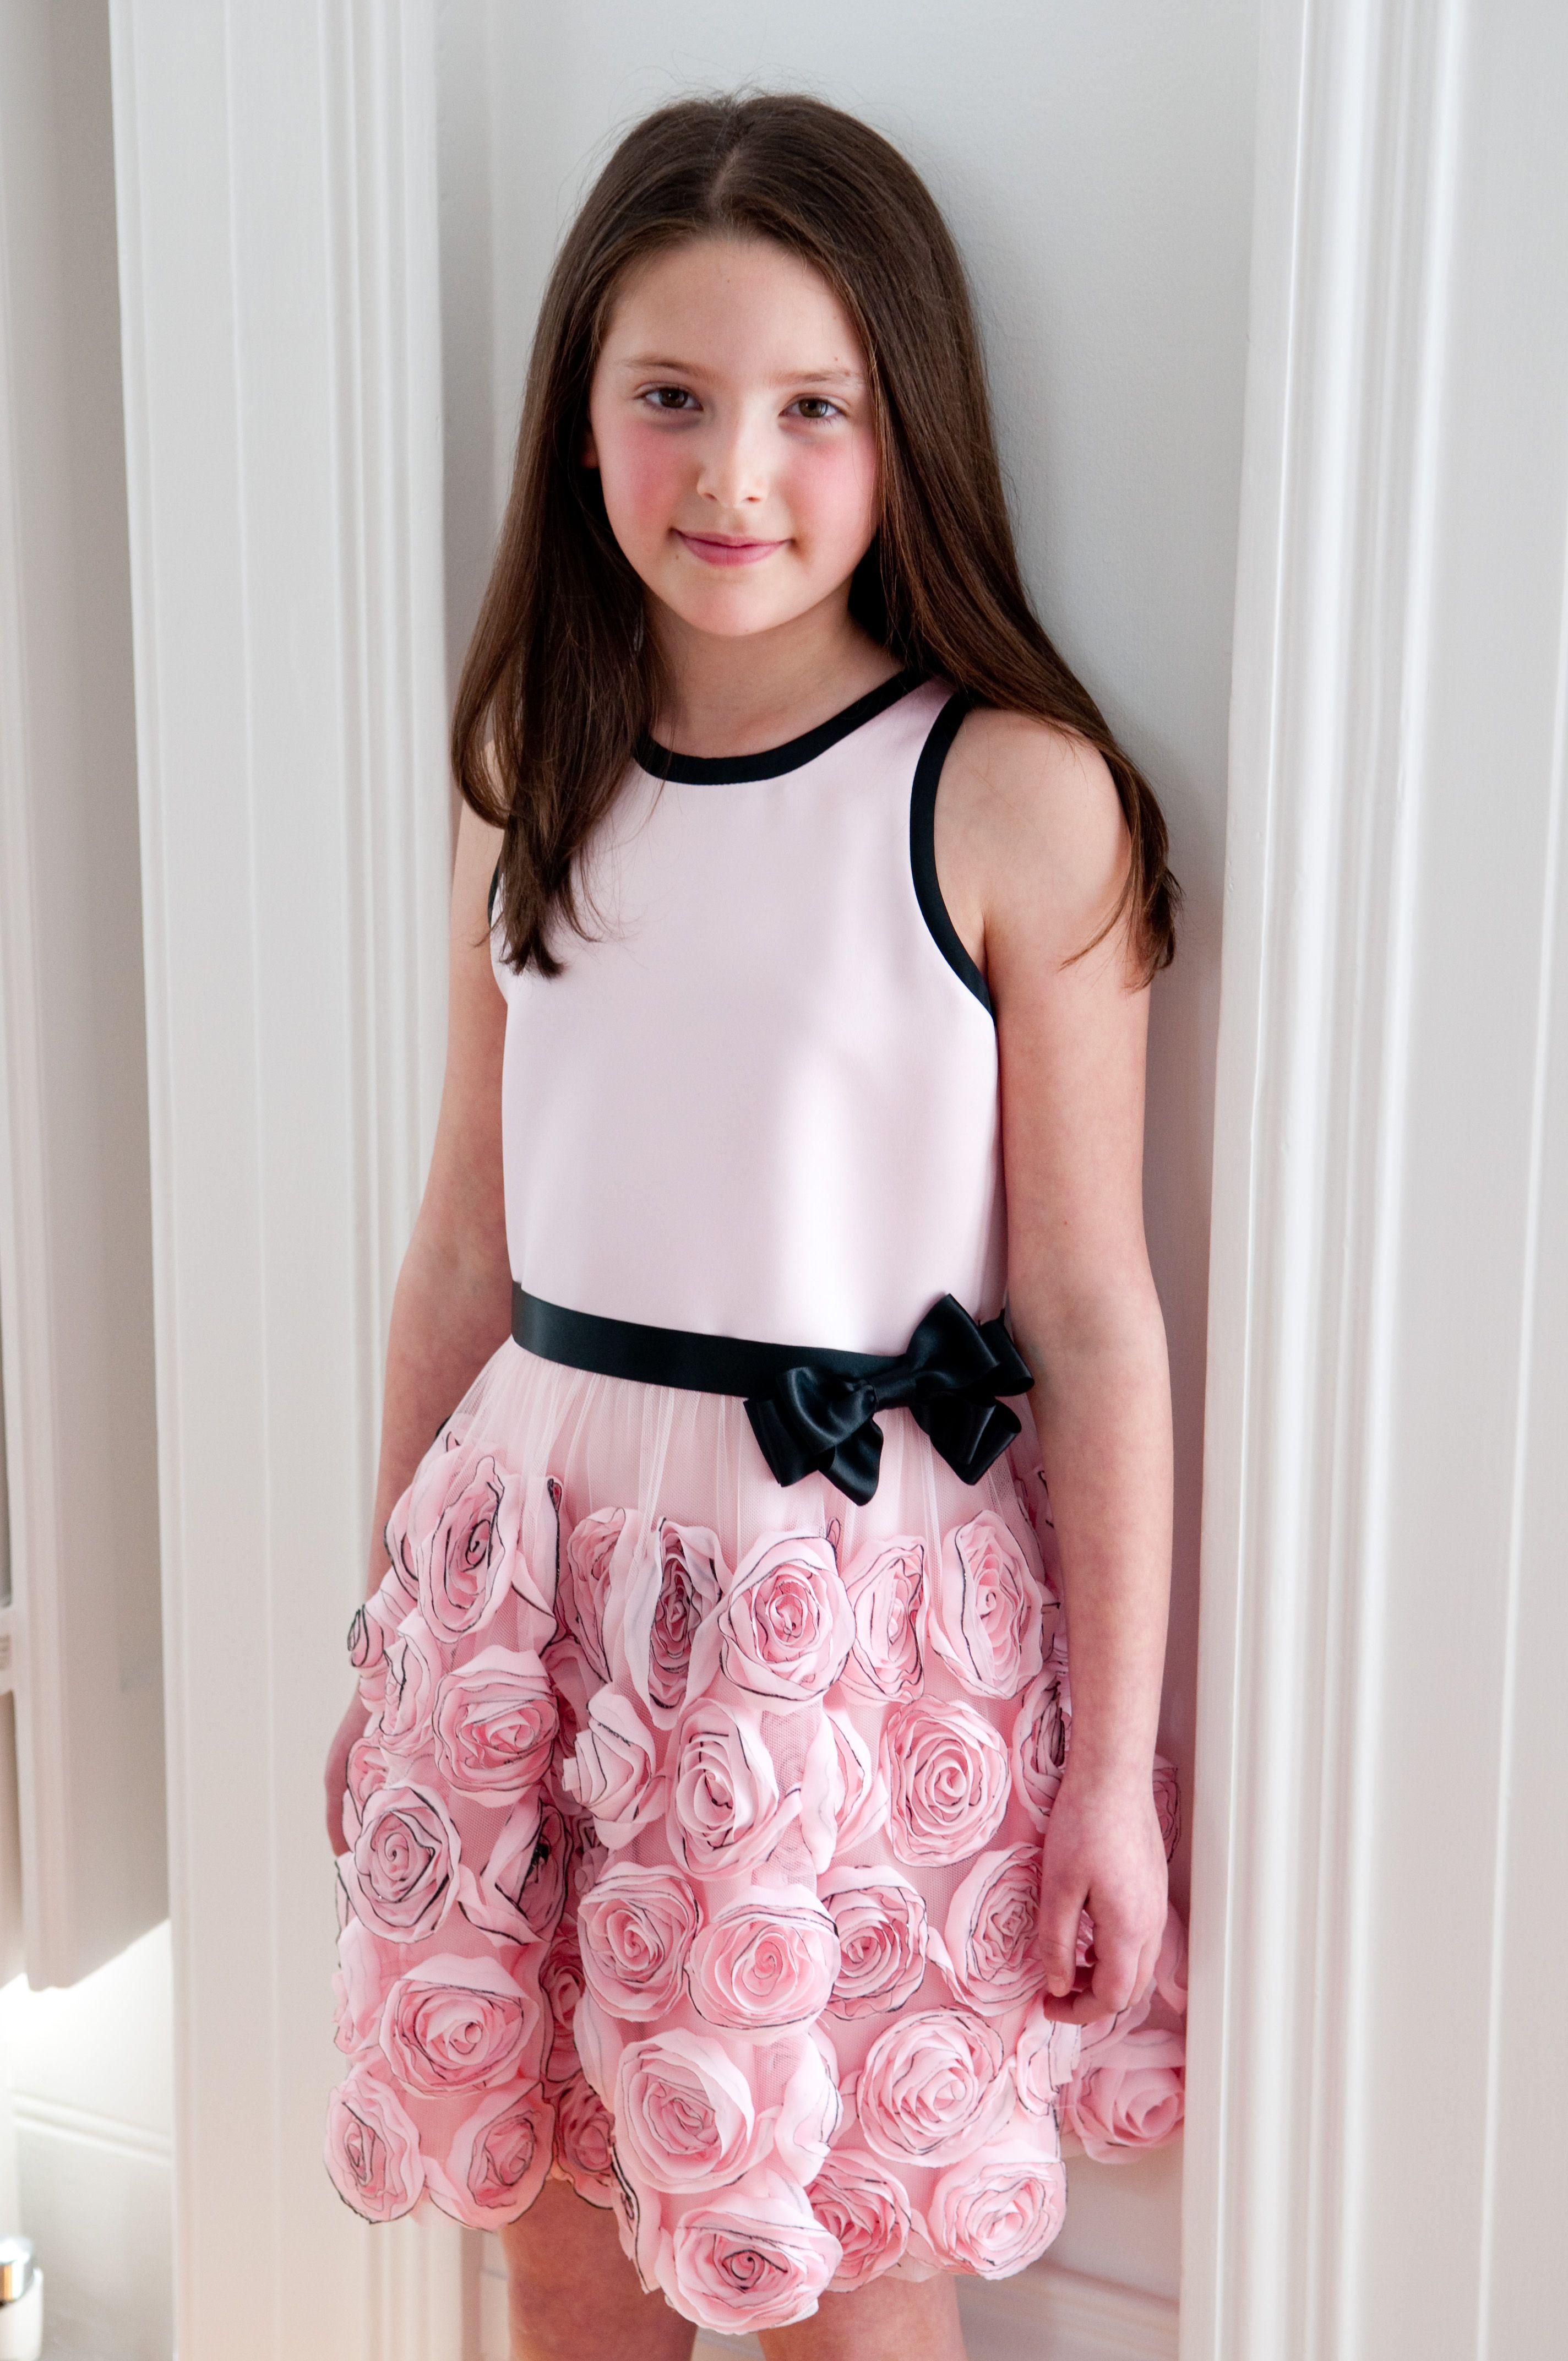 Party Semi Formal Prom Girls Dress Size 10 -11yrs Tween Teens ...